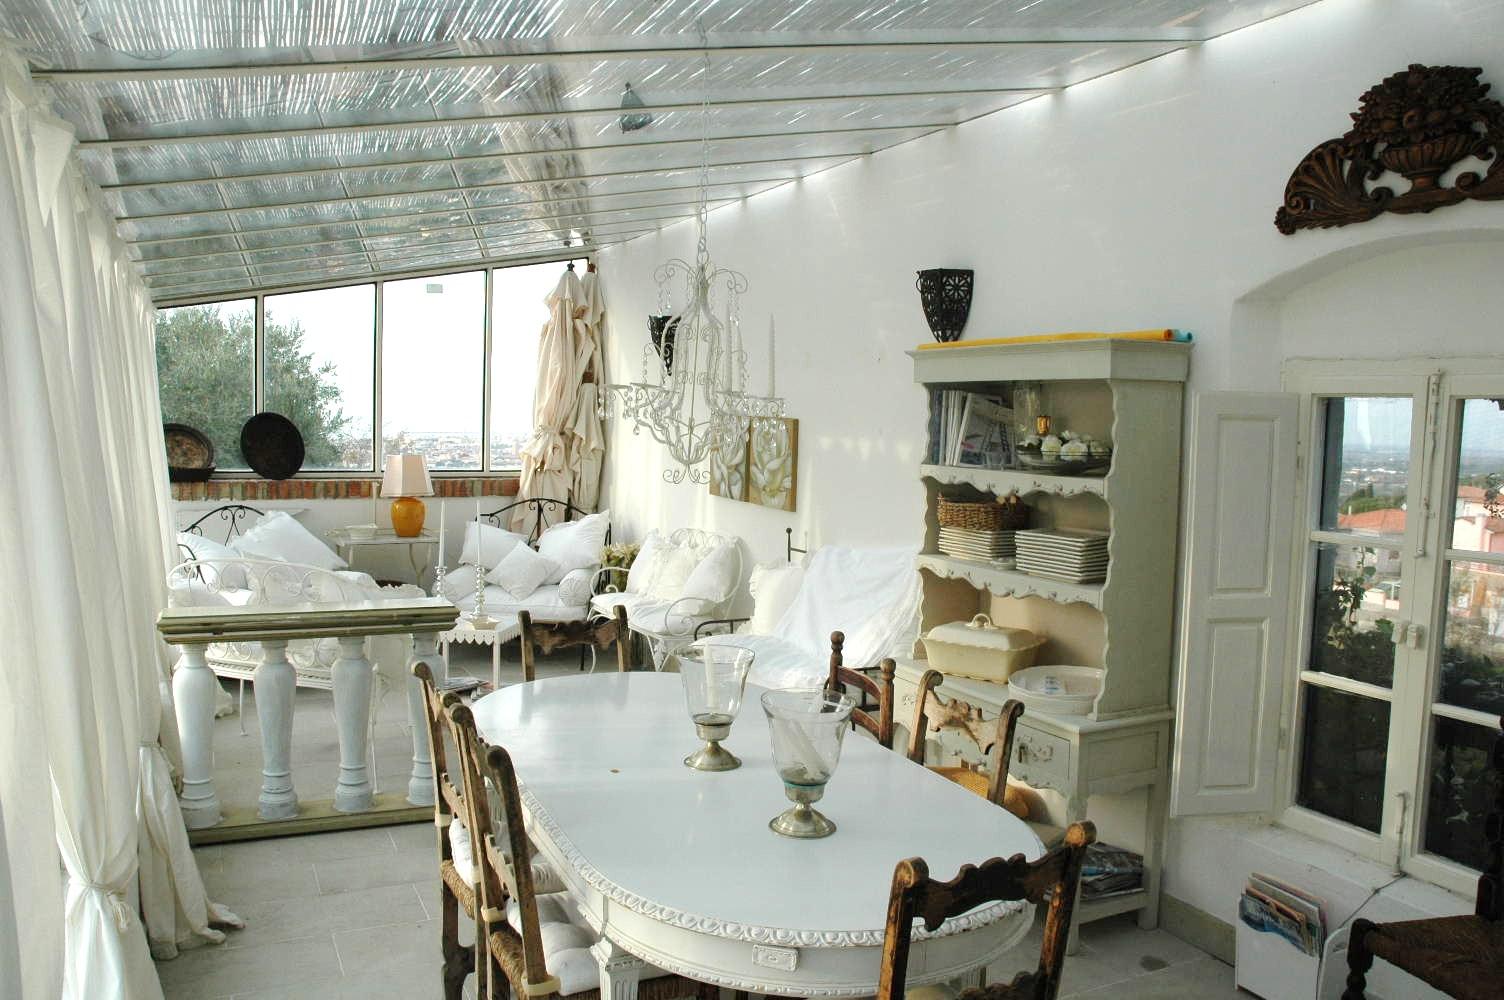 Come arredare la veranda garden house lazzerini for Arredare la veranda